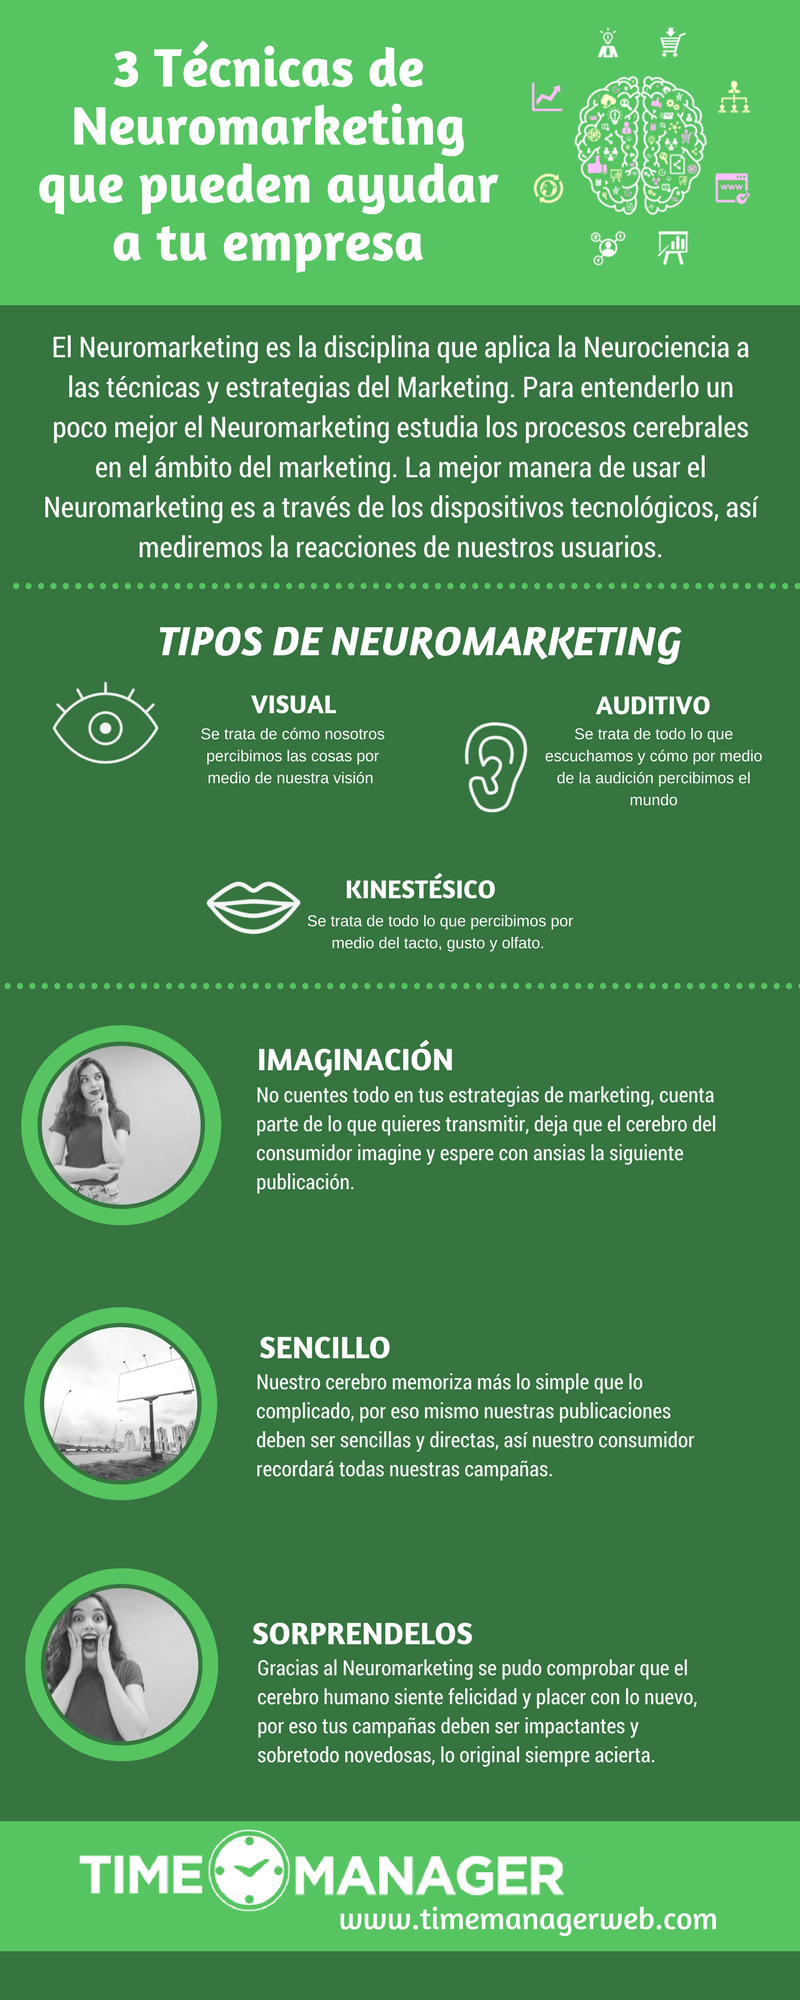 3 Técnicas de neuromarketing que puede ayudar a tu empresa